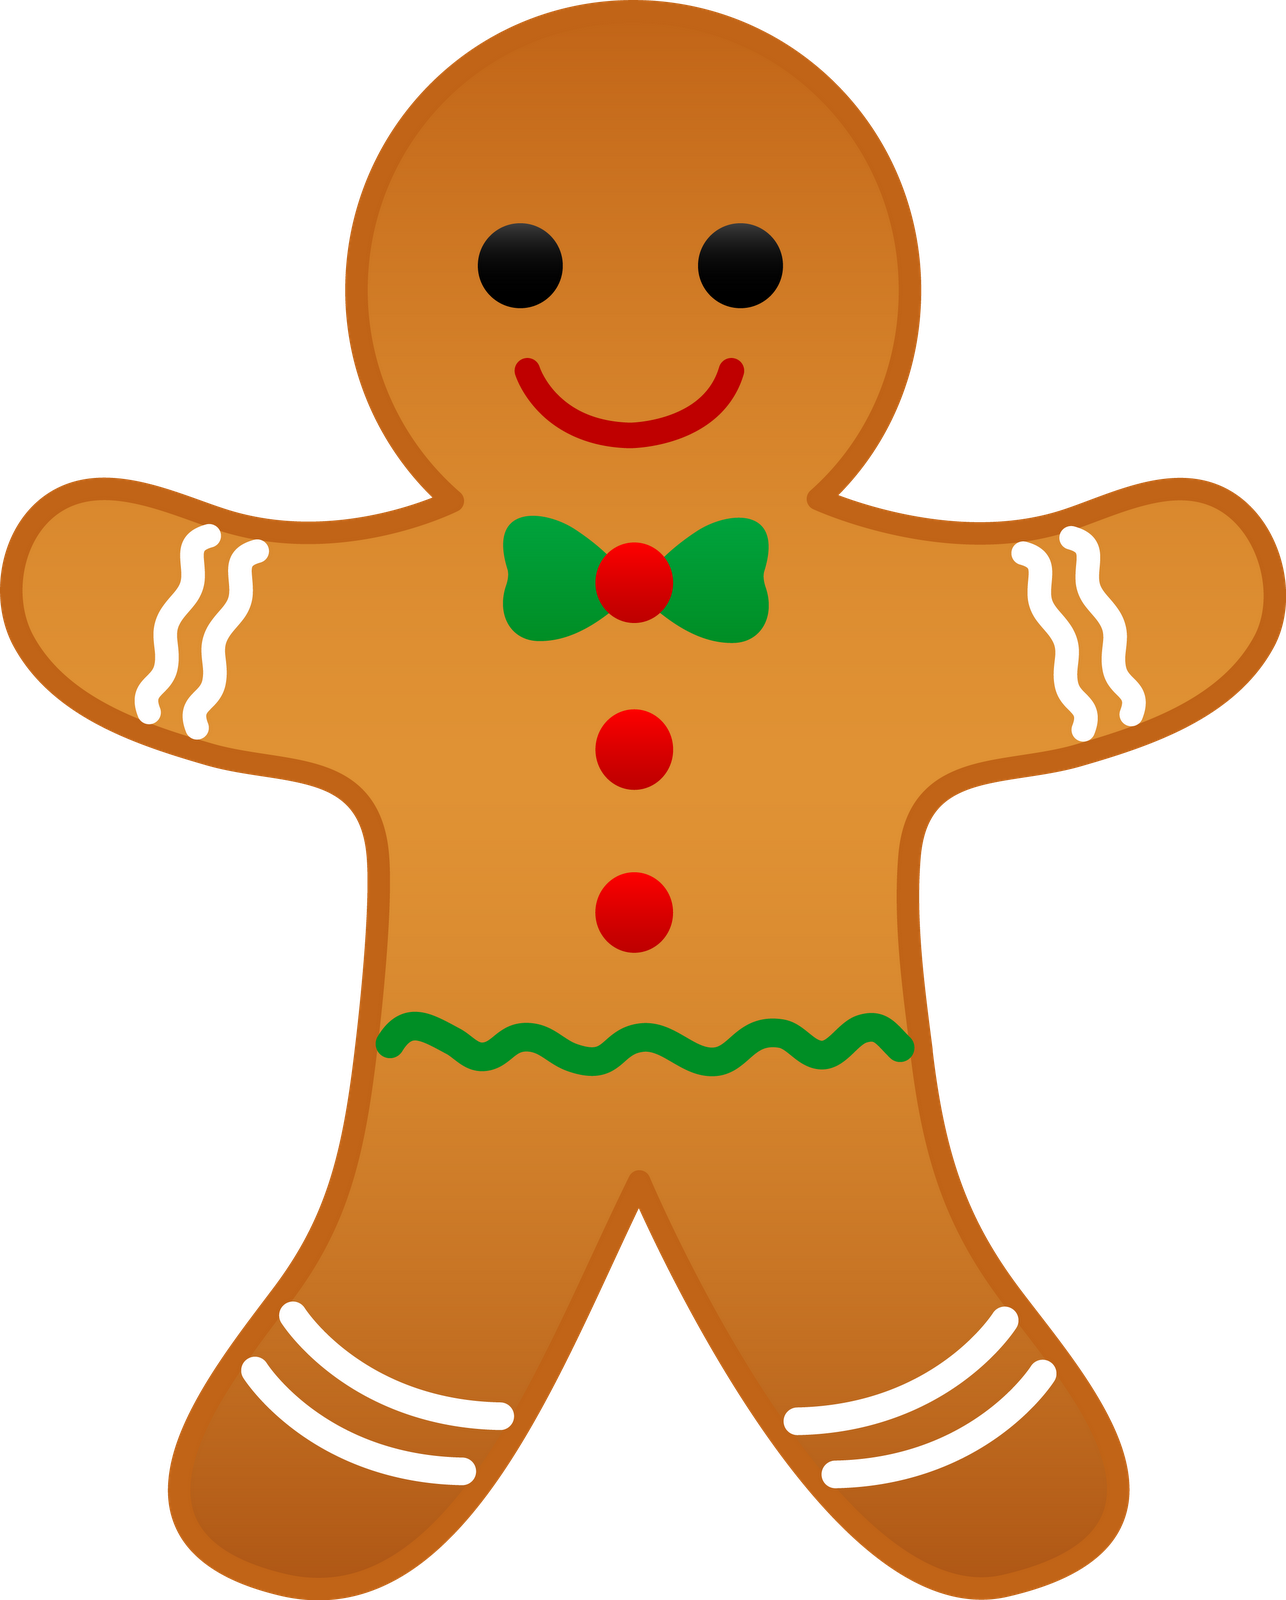 1286x1600 Free Christmas Clipart Animated Clip Art Santa Image 5 2